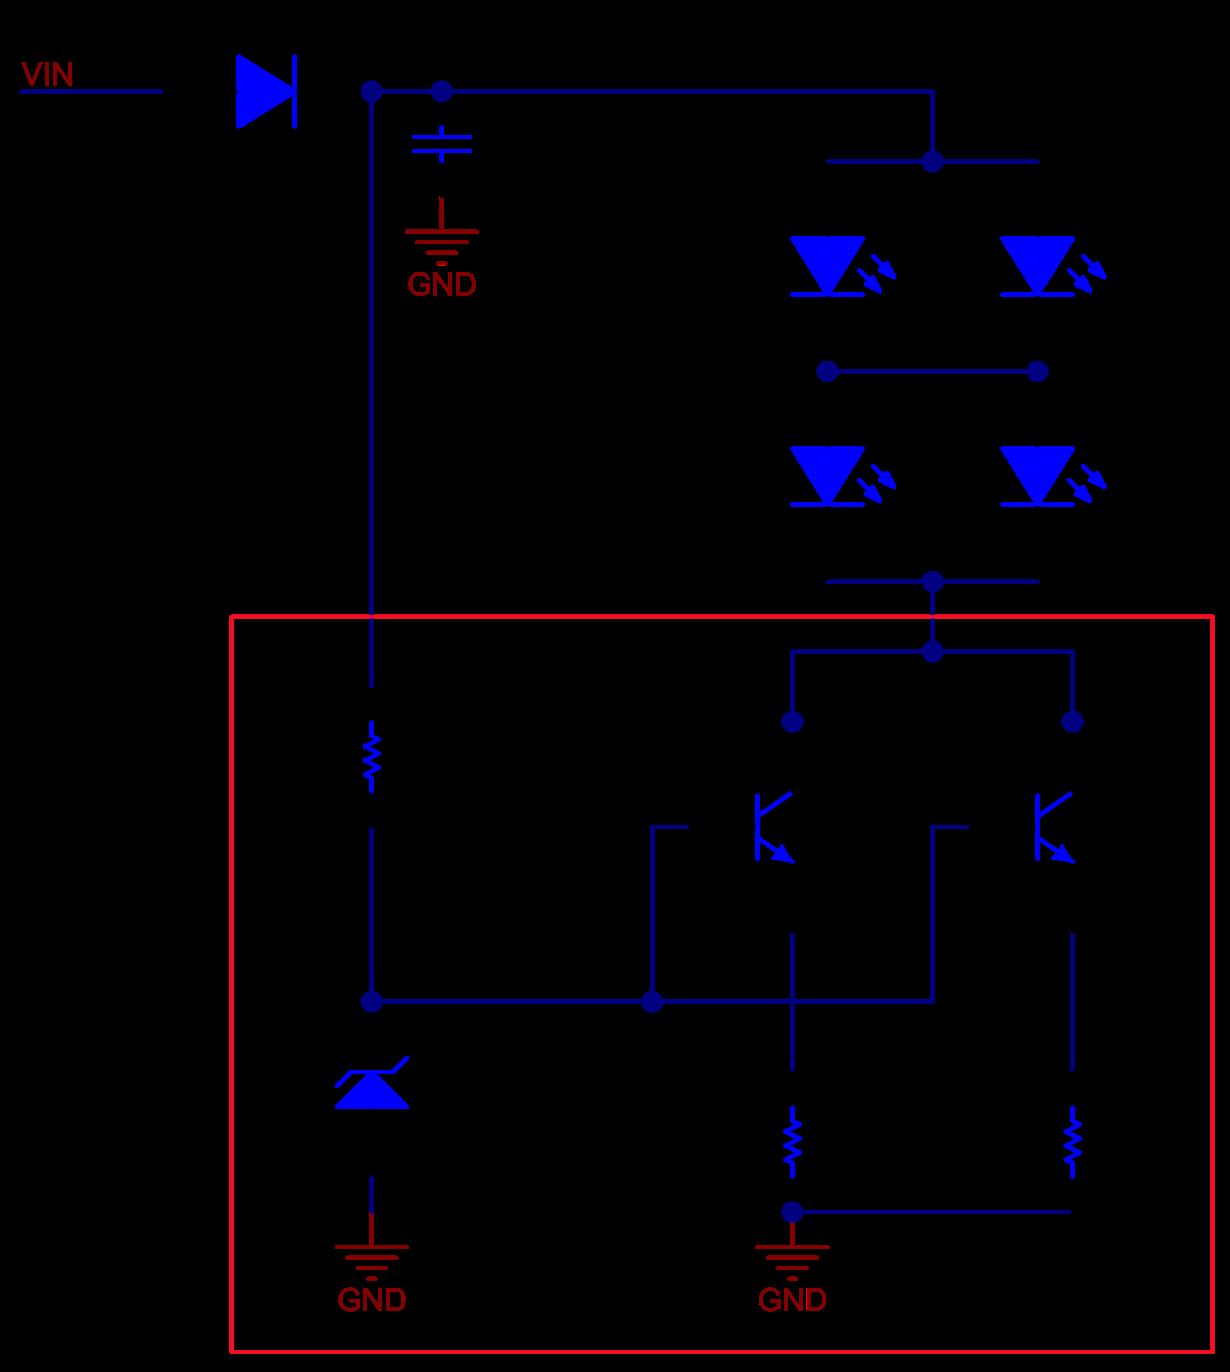 E2e Power Saver Circuit Diagram Schematic Youtube - Diagram ... on magic bullet diagram, speaker diagram, touch screen diagram, electric fan diagram, popcorn maker diagram, induction cooker diagram, record player diagram,